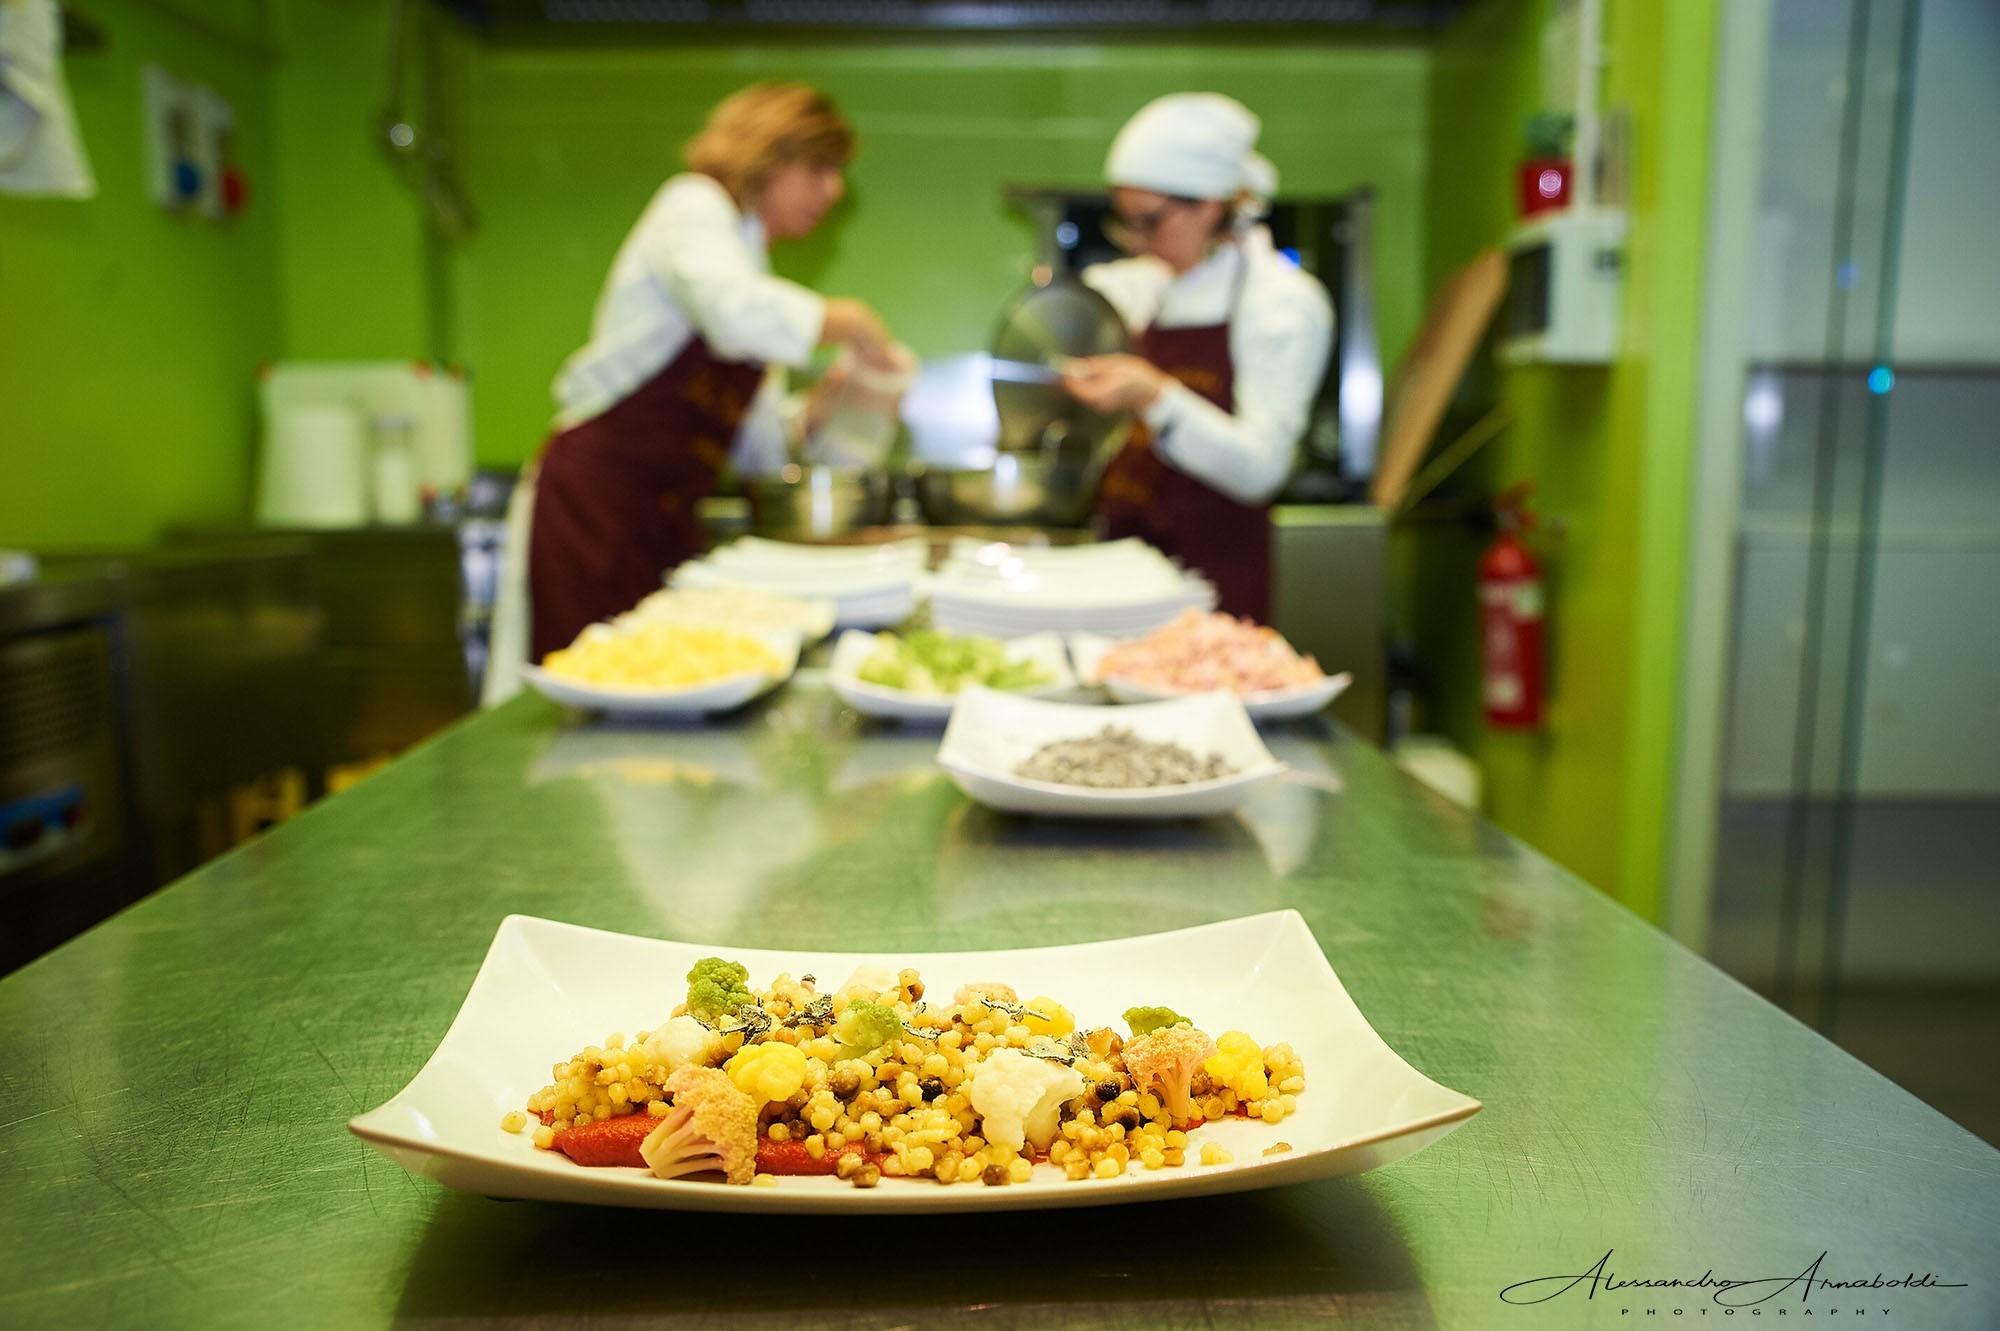 Cavoli... che cena! | Flick on Food